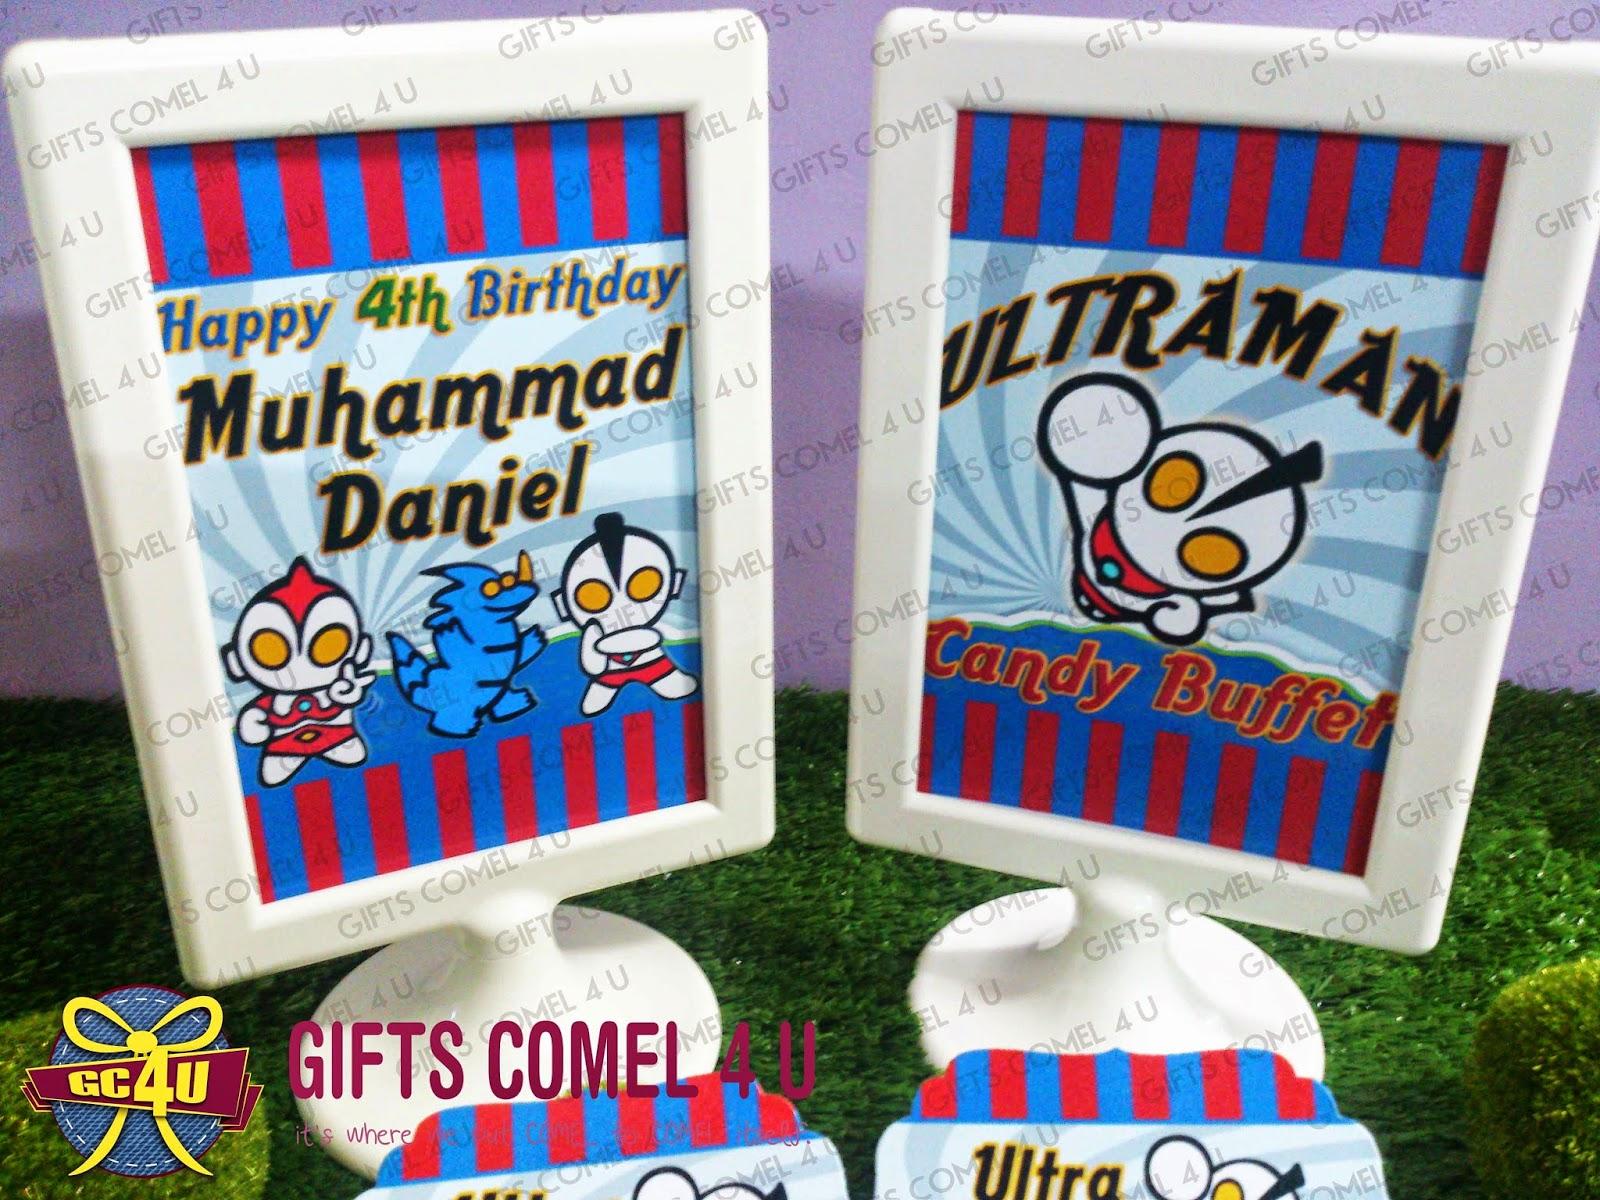 Gifts Comel 4 U Ordered by Nur Vicky Kawaii Ultraman bluered